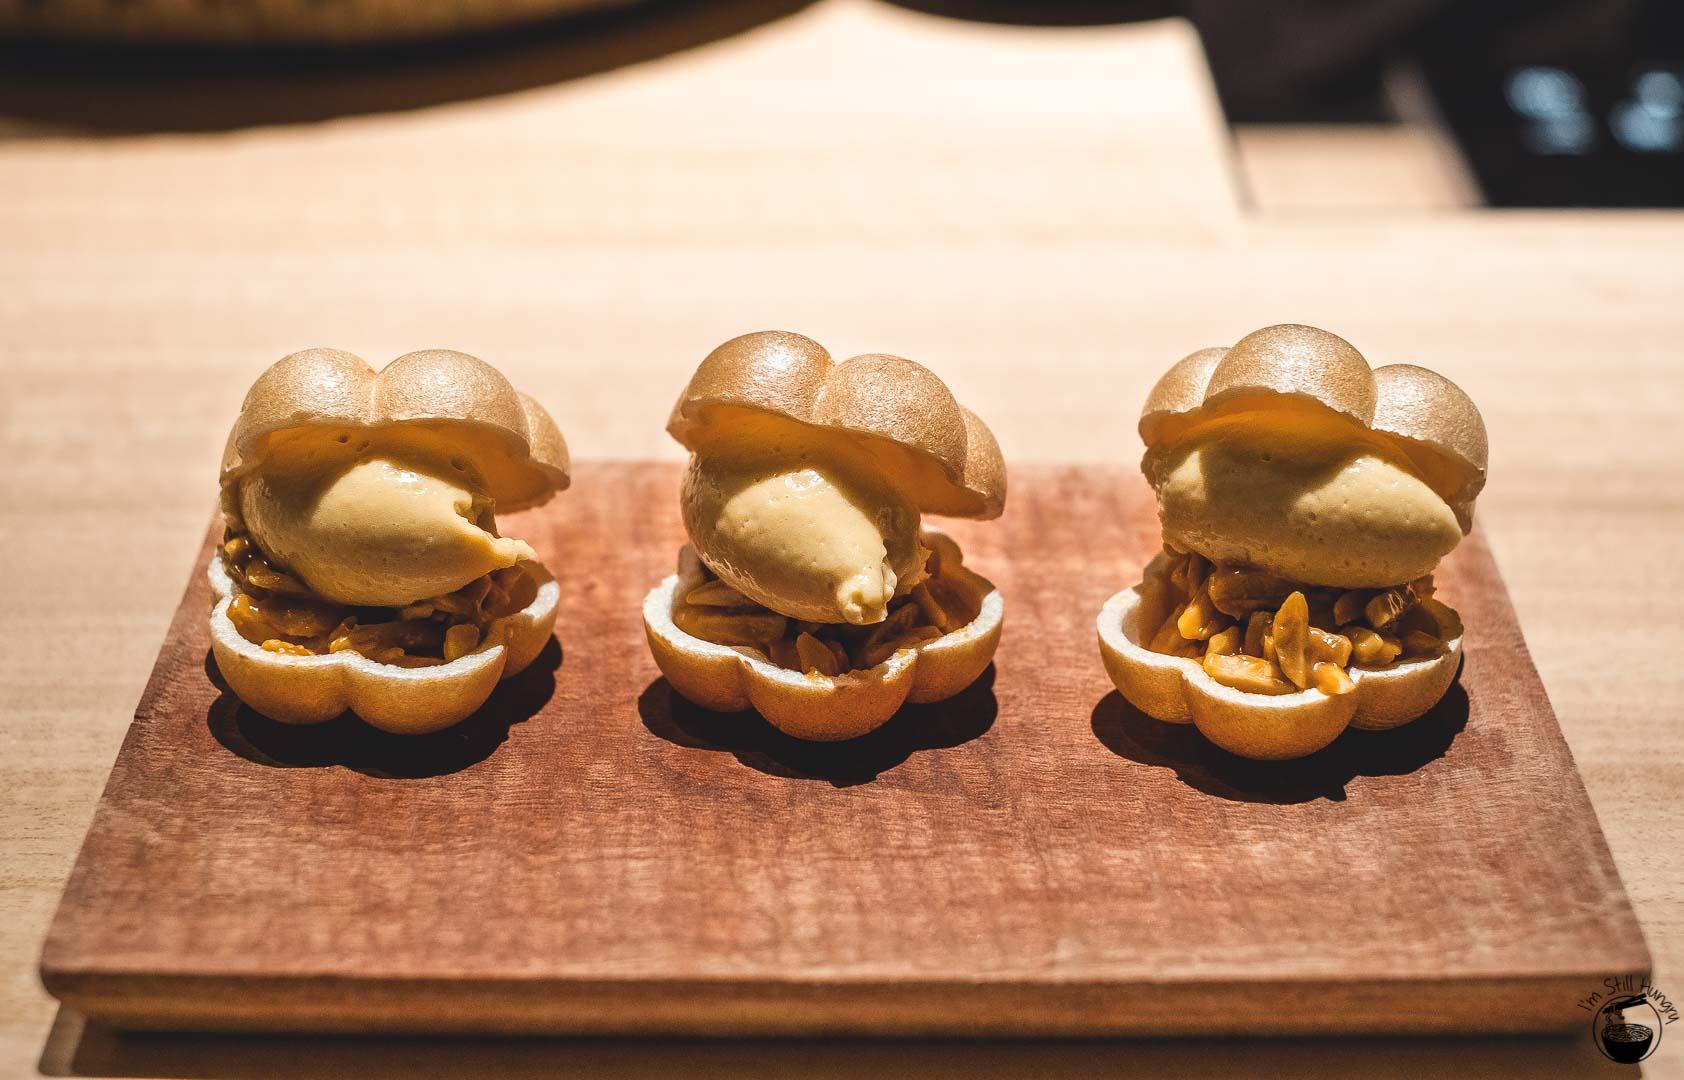 Restaurant Sasaki Surry Hills Second Visit-12 Caramel & nuts